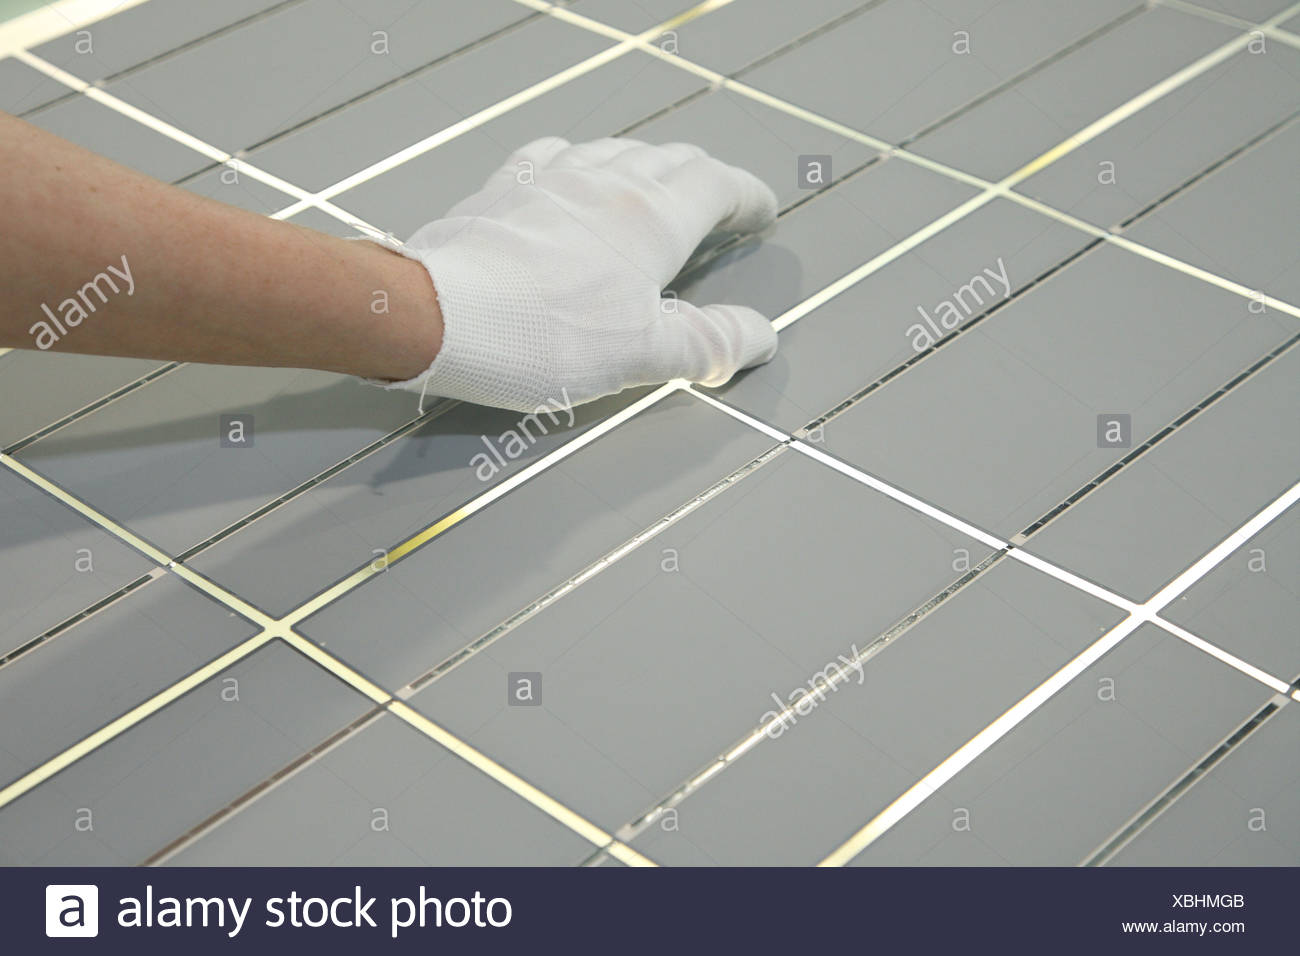 Berlin, Deutschland, die Solarzellen Sonnenenergie Firma Solon SE Stockbild